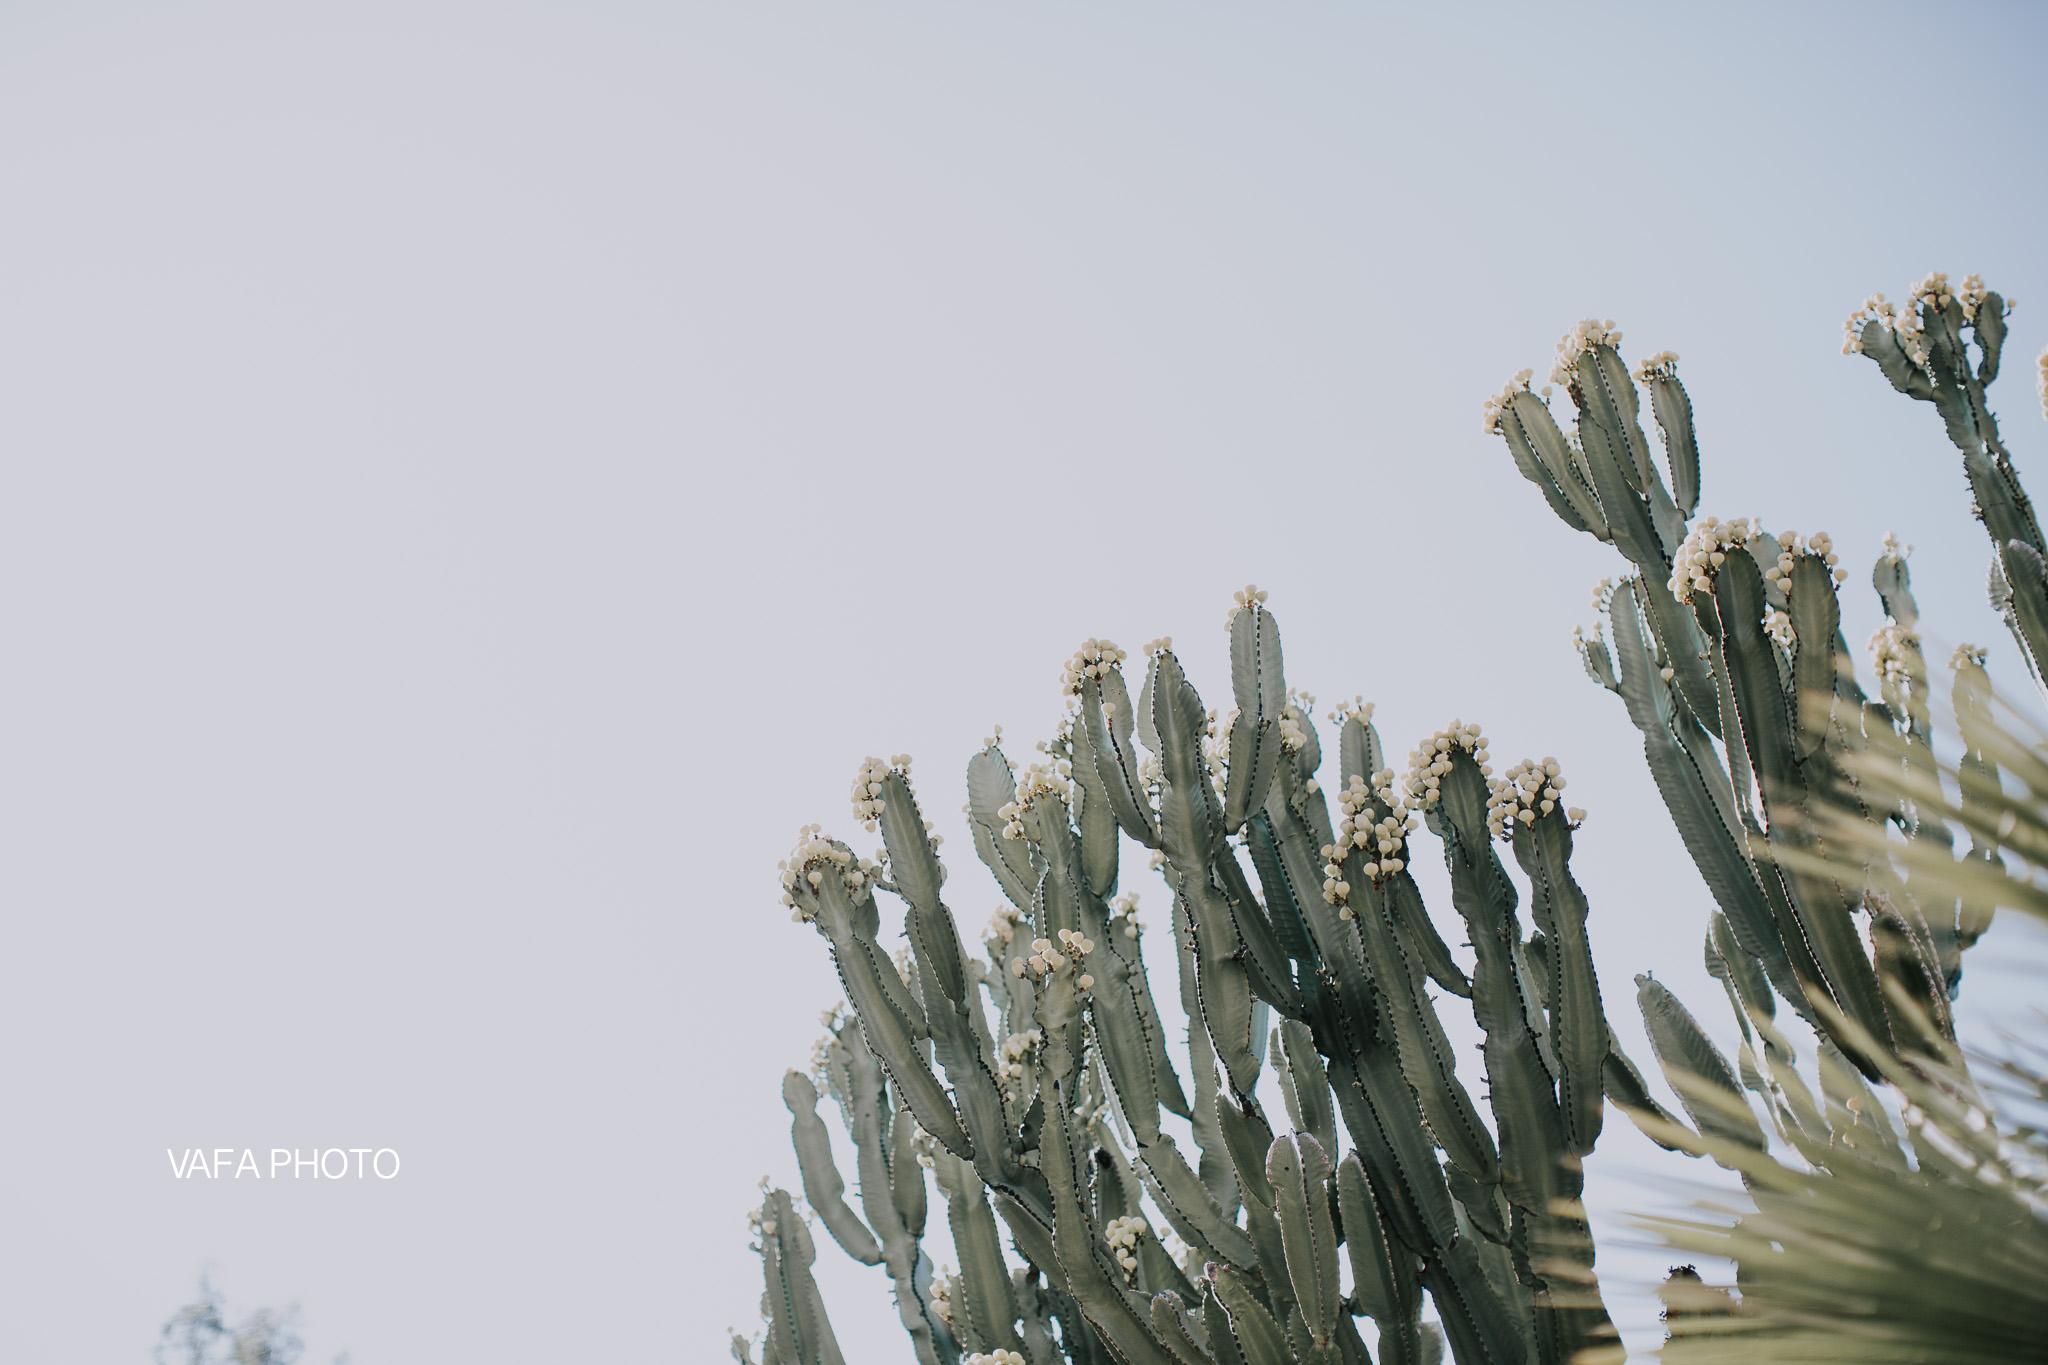 Leo-Carrillo-Ranch-Wedding-Lauren-Mike-Vafa-Photo-208.jpg